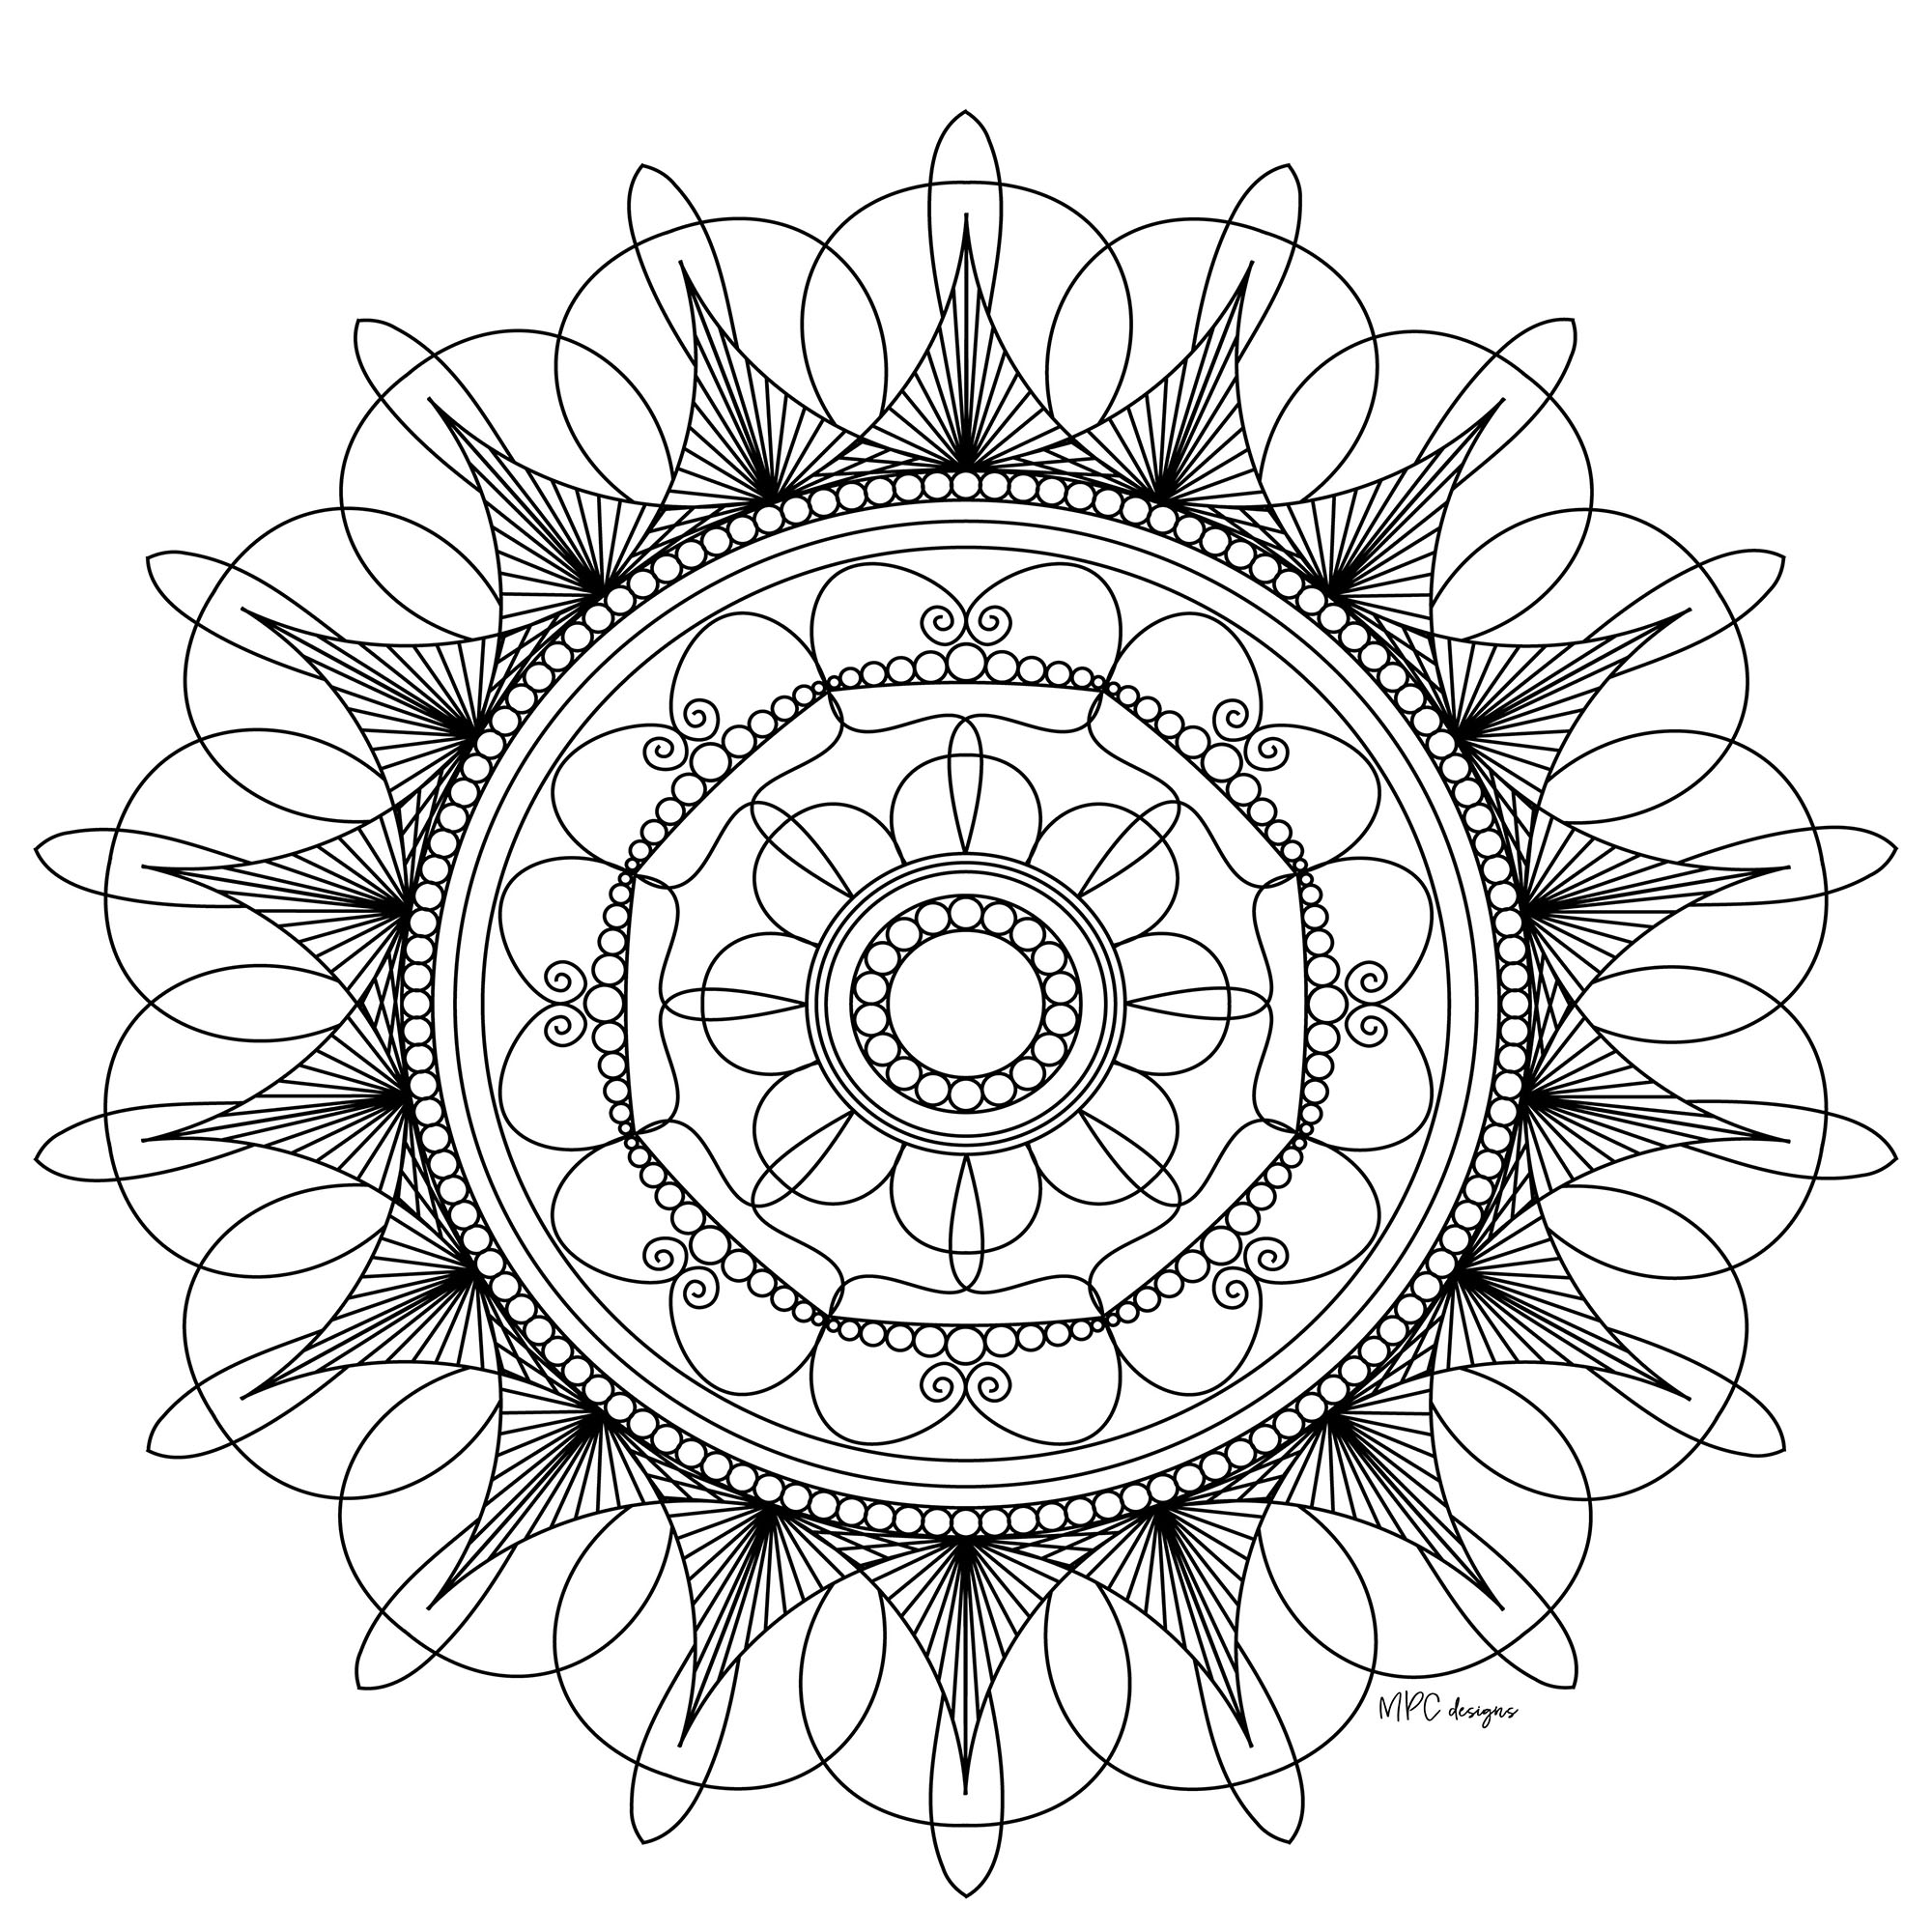 Mandala with pearls